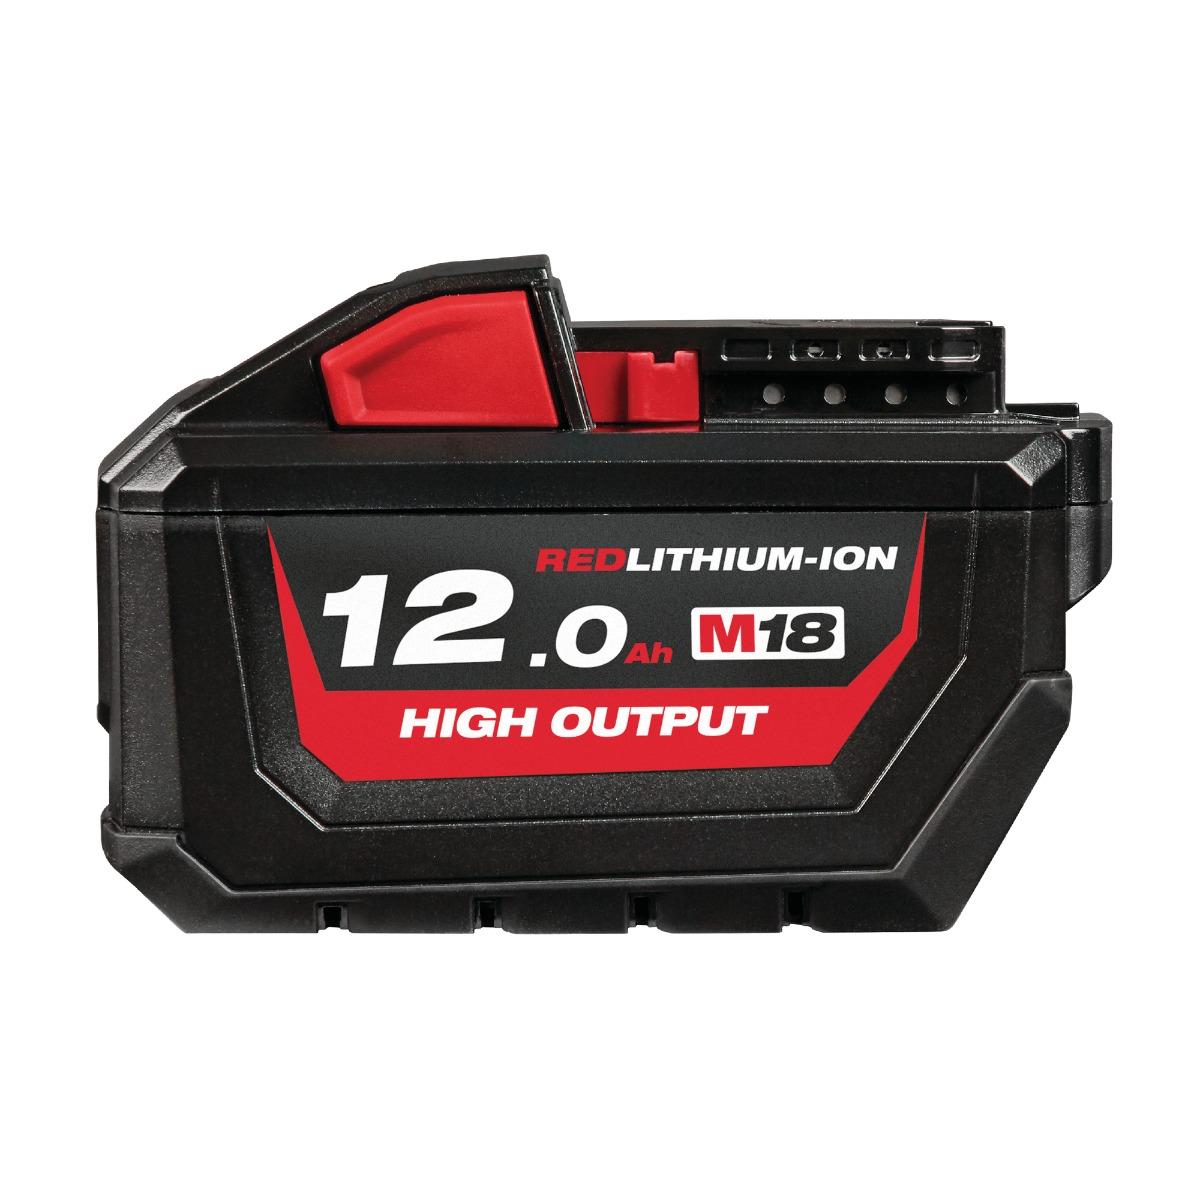 Batteri M18 HIGH OUTPUT™ 12.0Ah